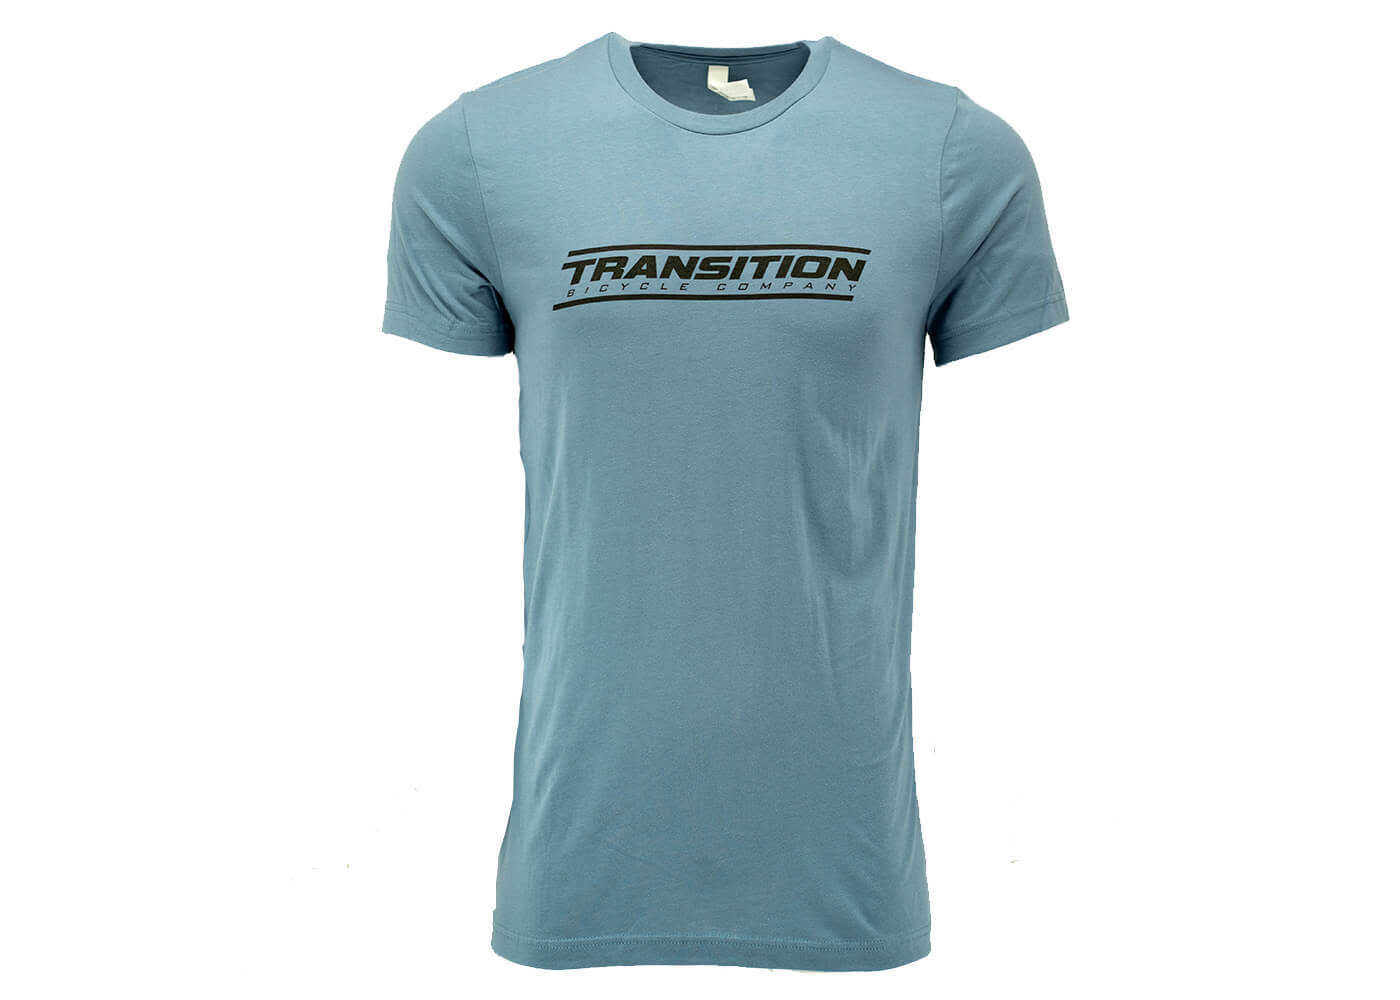 Transition T-Shirt: Transition Logo (Steel Blue, Large)